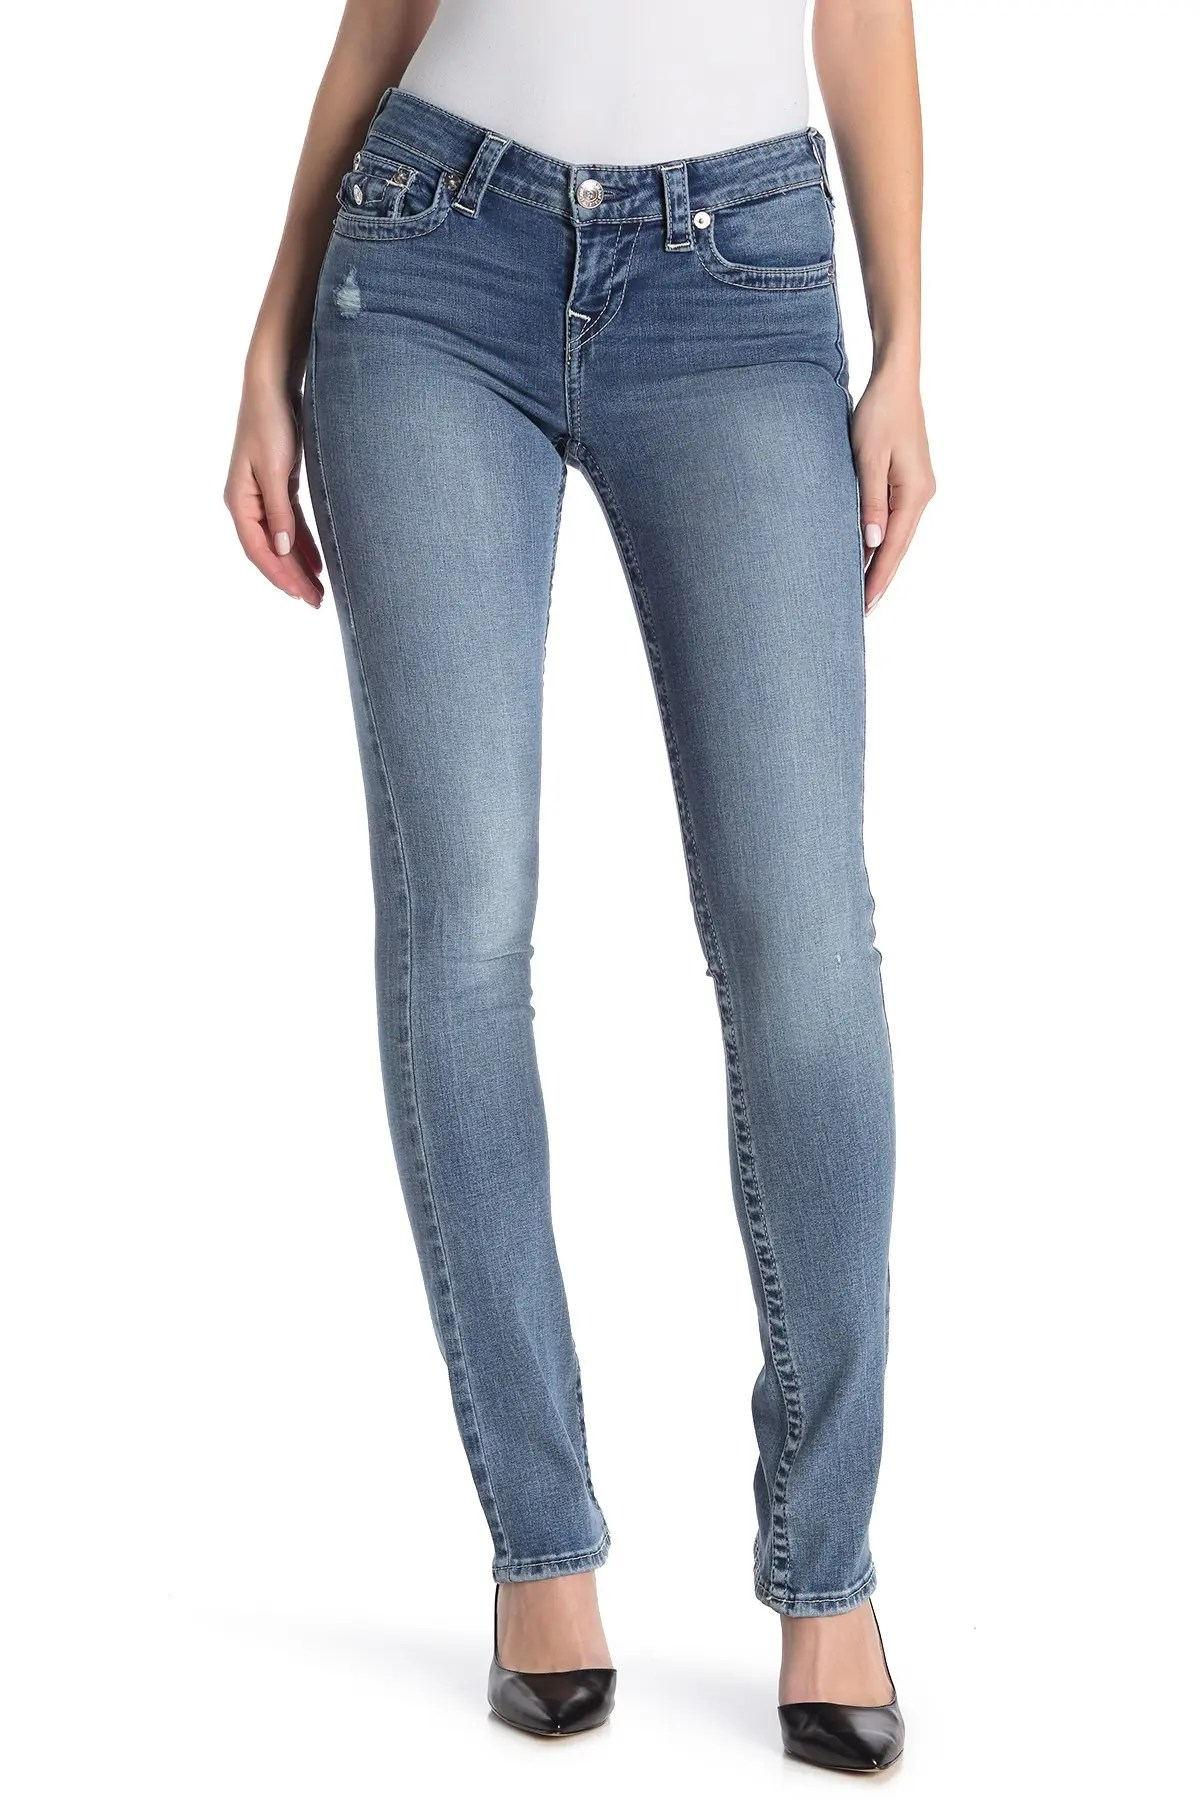 true religion billie flap pocket mid rise straight jeans nordstrom rack